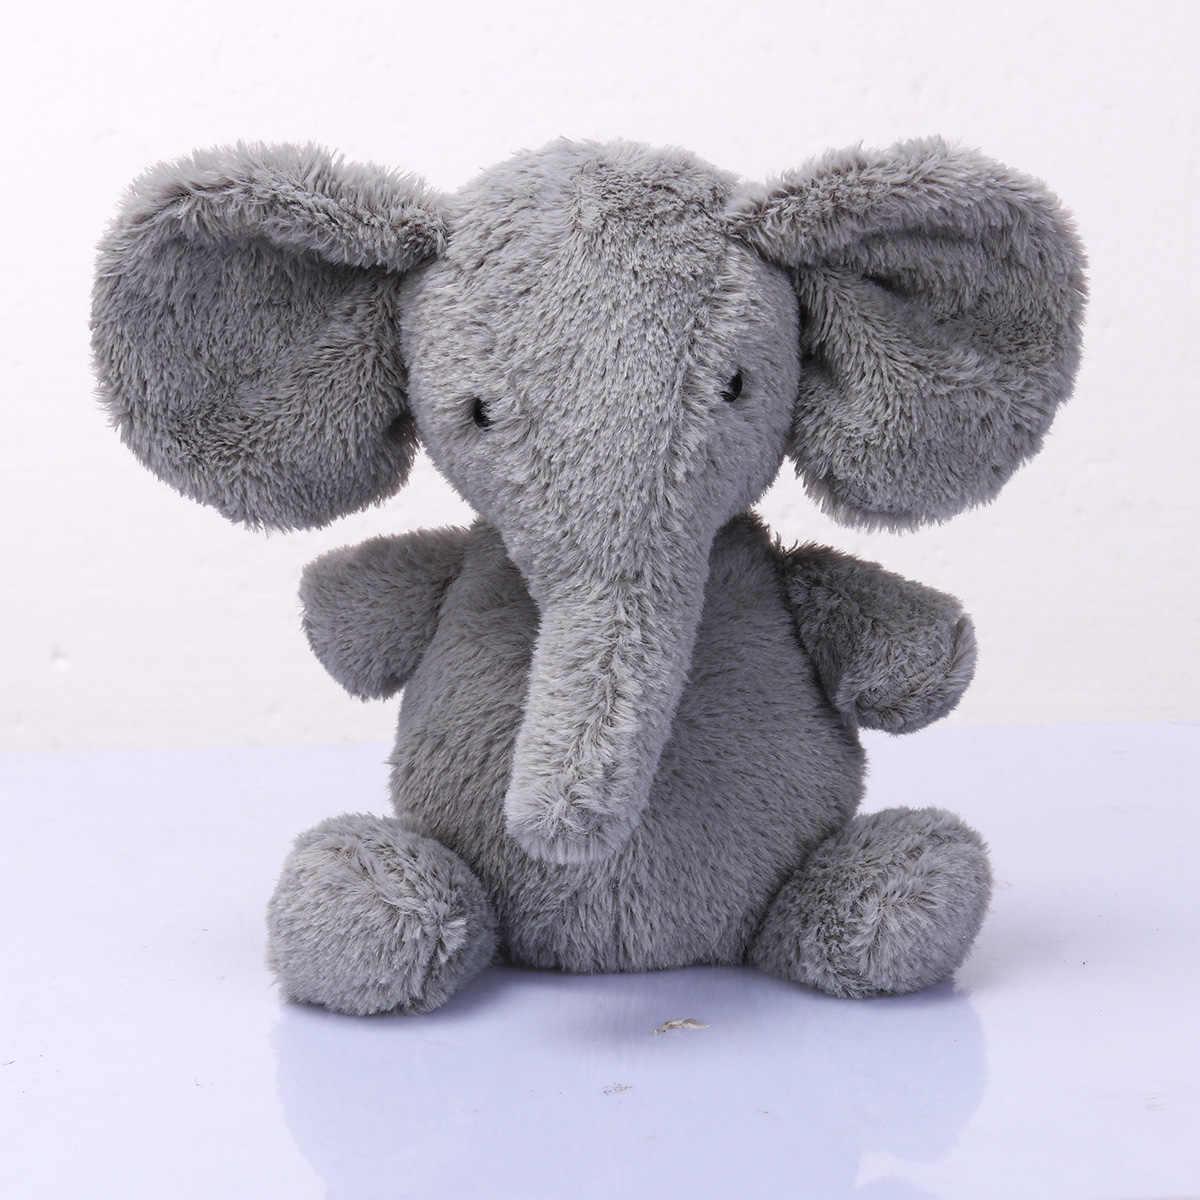 1PC かわいい枕象子供ソフトスタッフぬいぐるみ人形ロング鼻腰椎クッション姉妹リトルぬいぐるみ象のおもちゃ